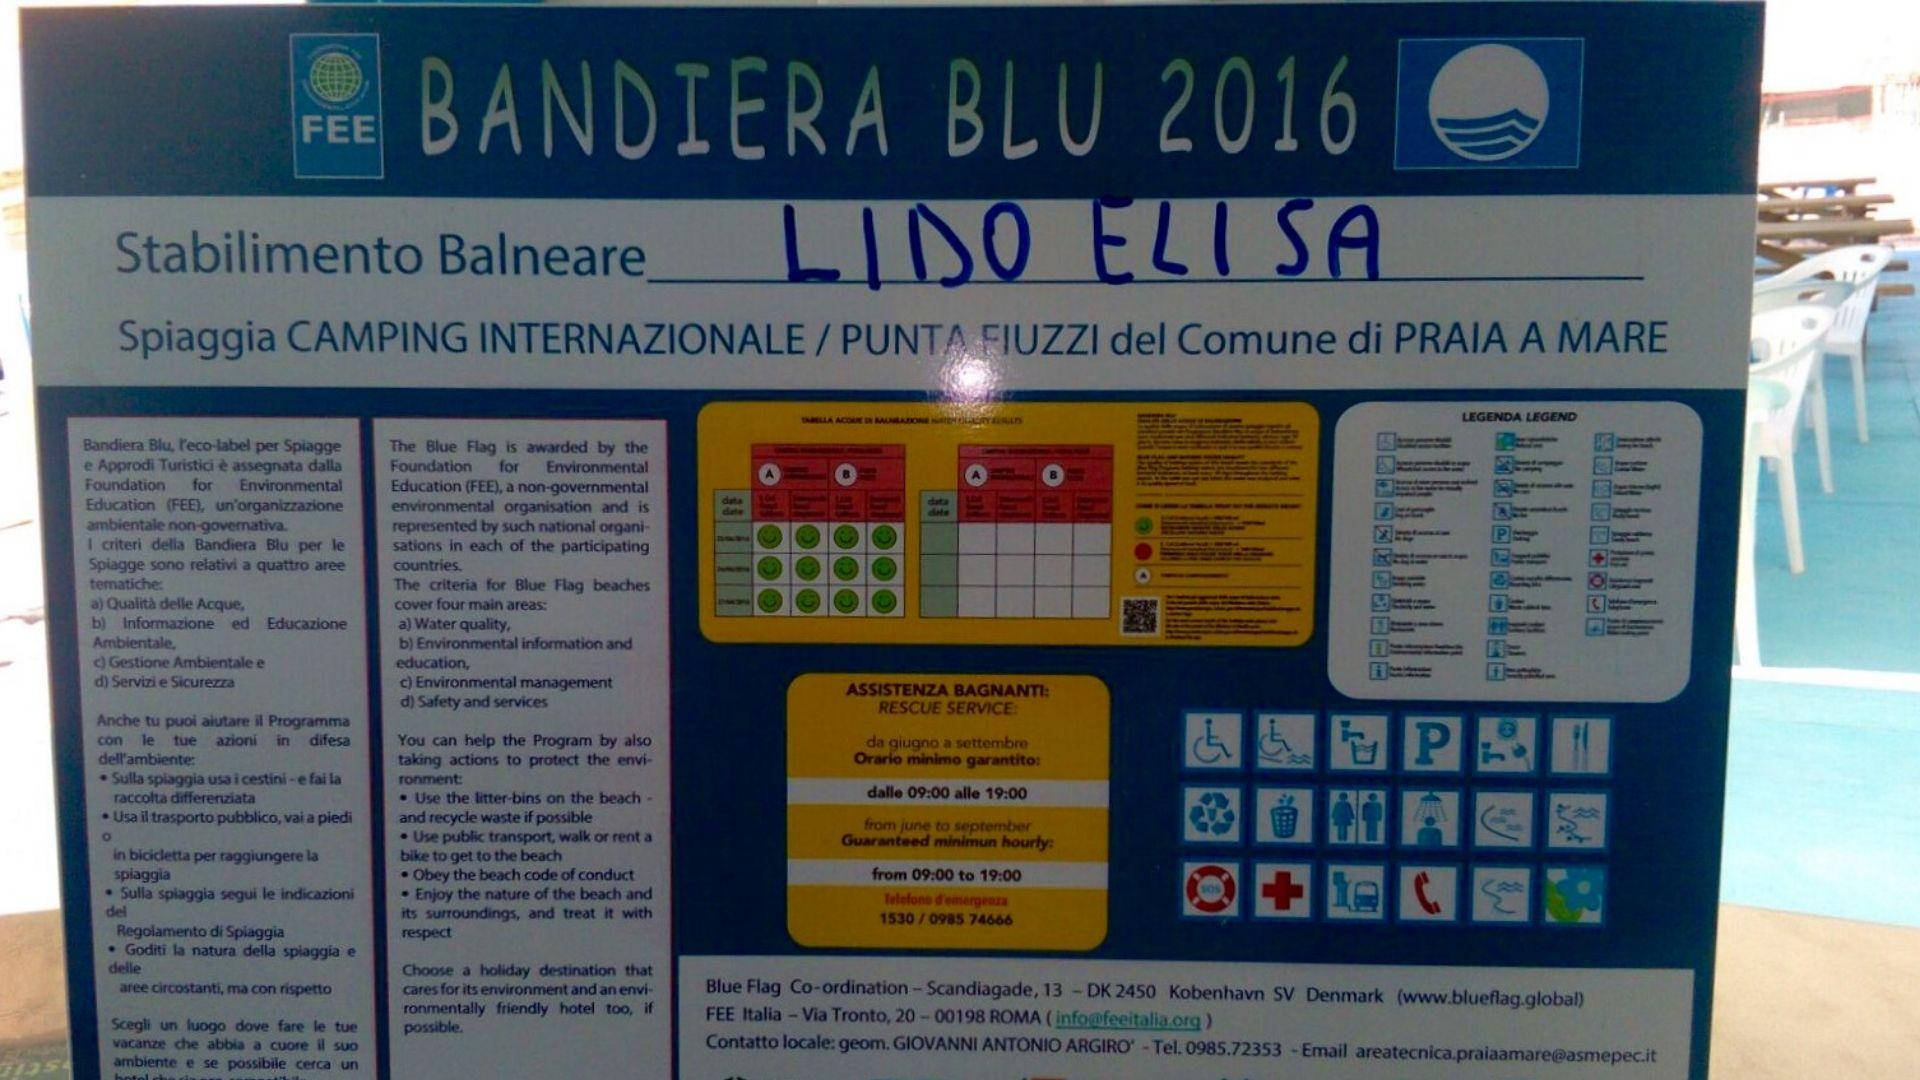 Bandiera Blu al Lido Elisa